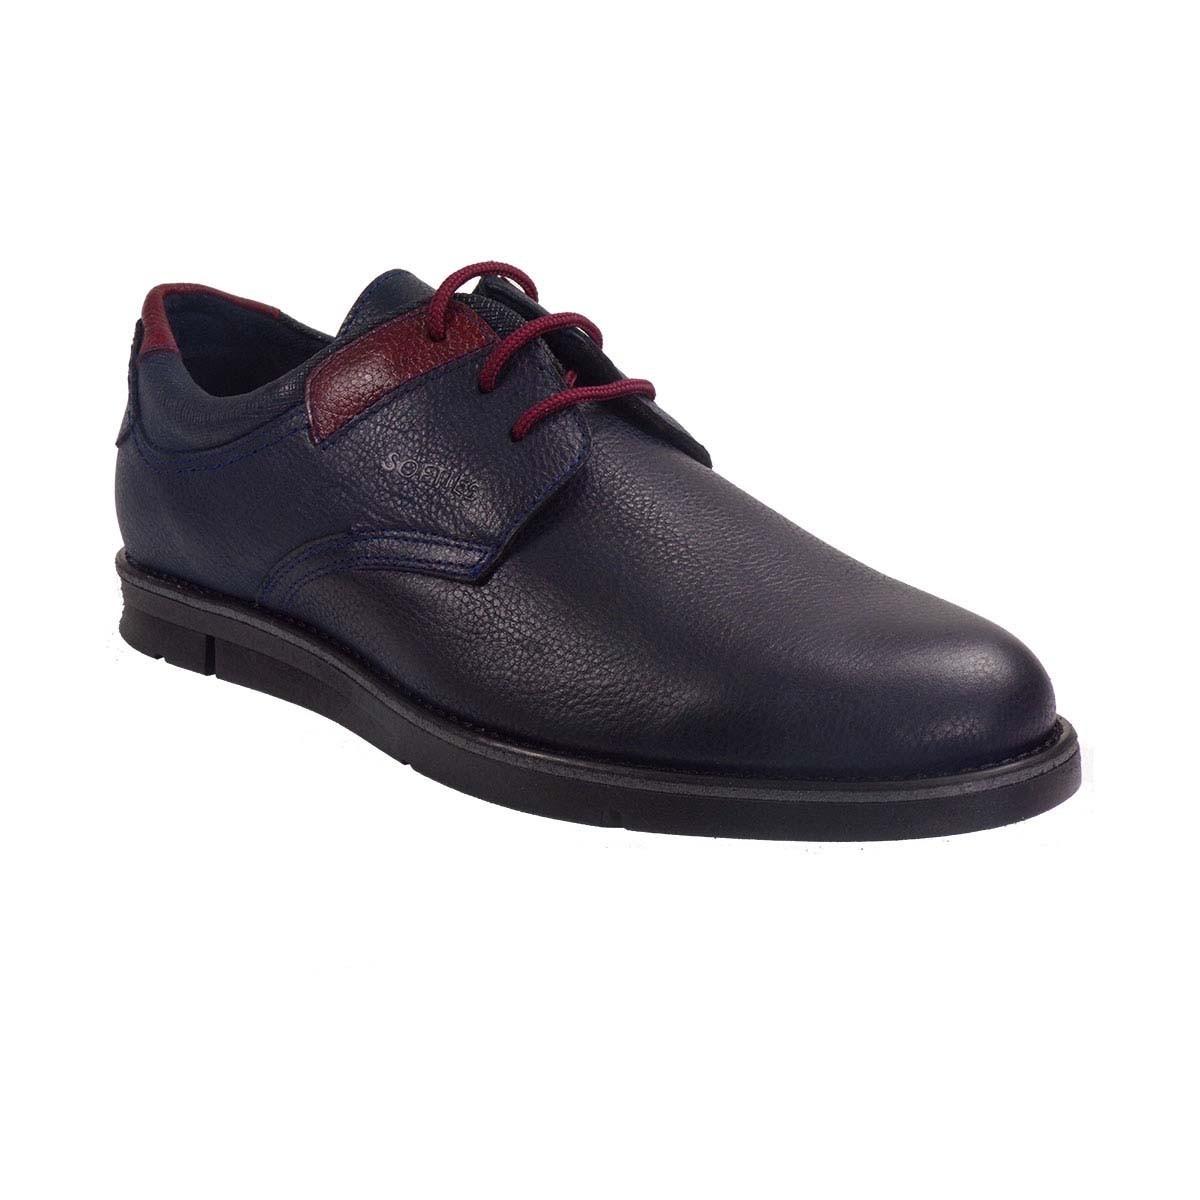 Softies Ανδρικά Παπούτσια 6923 Μπλέ Δέρμα